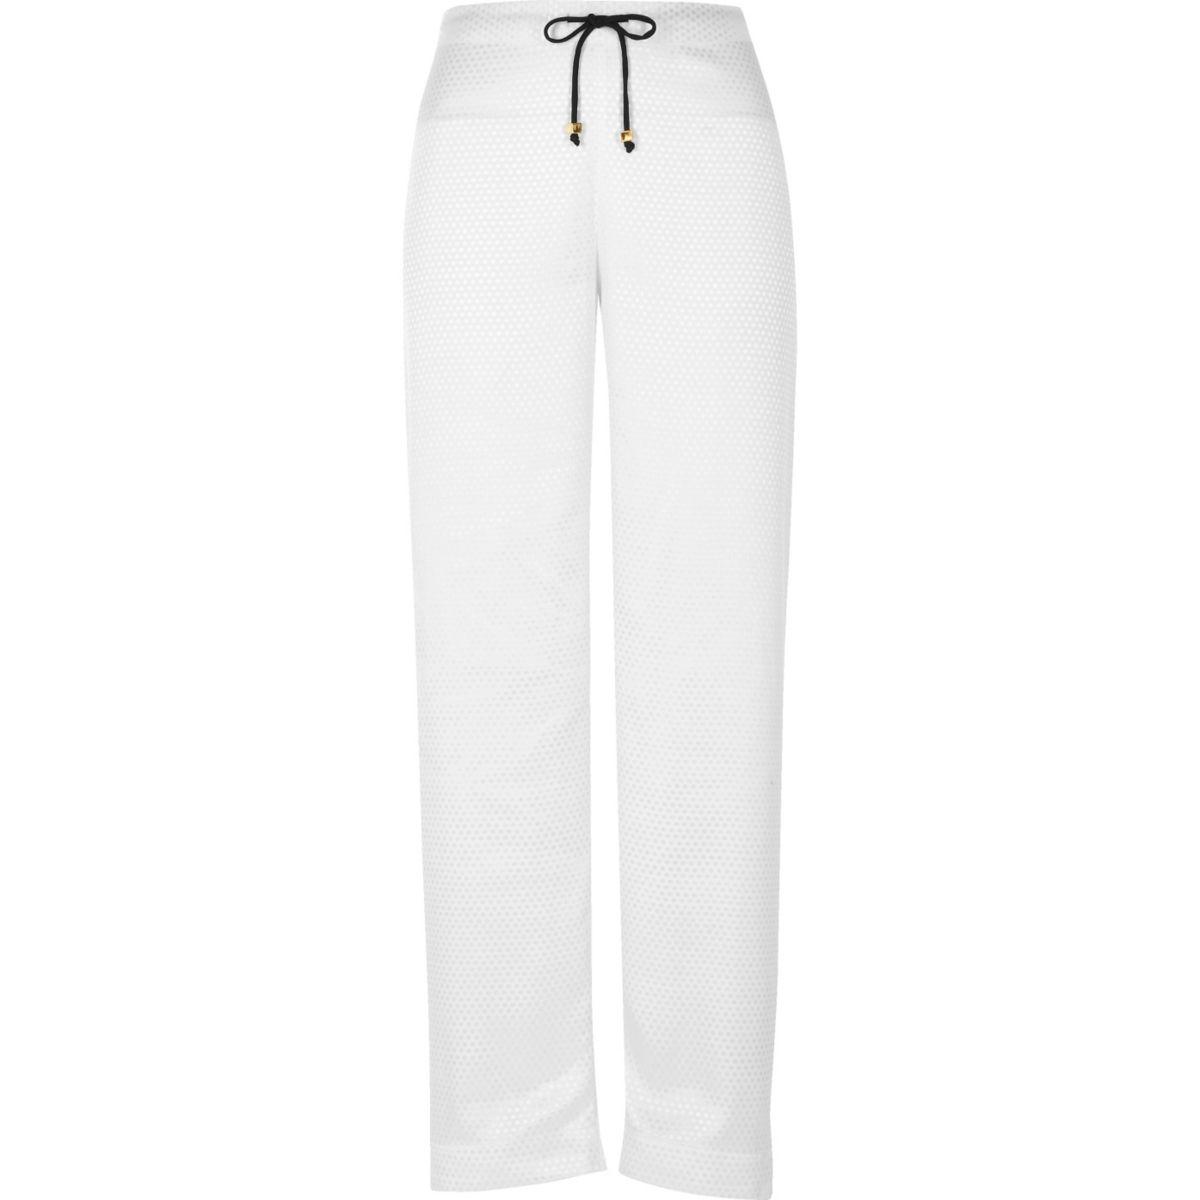 Weiße Pyjama-Hose